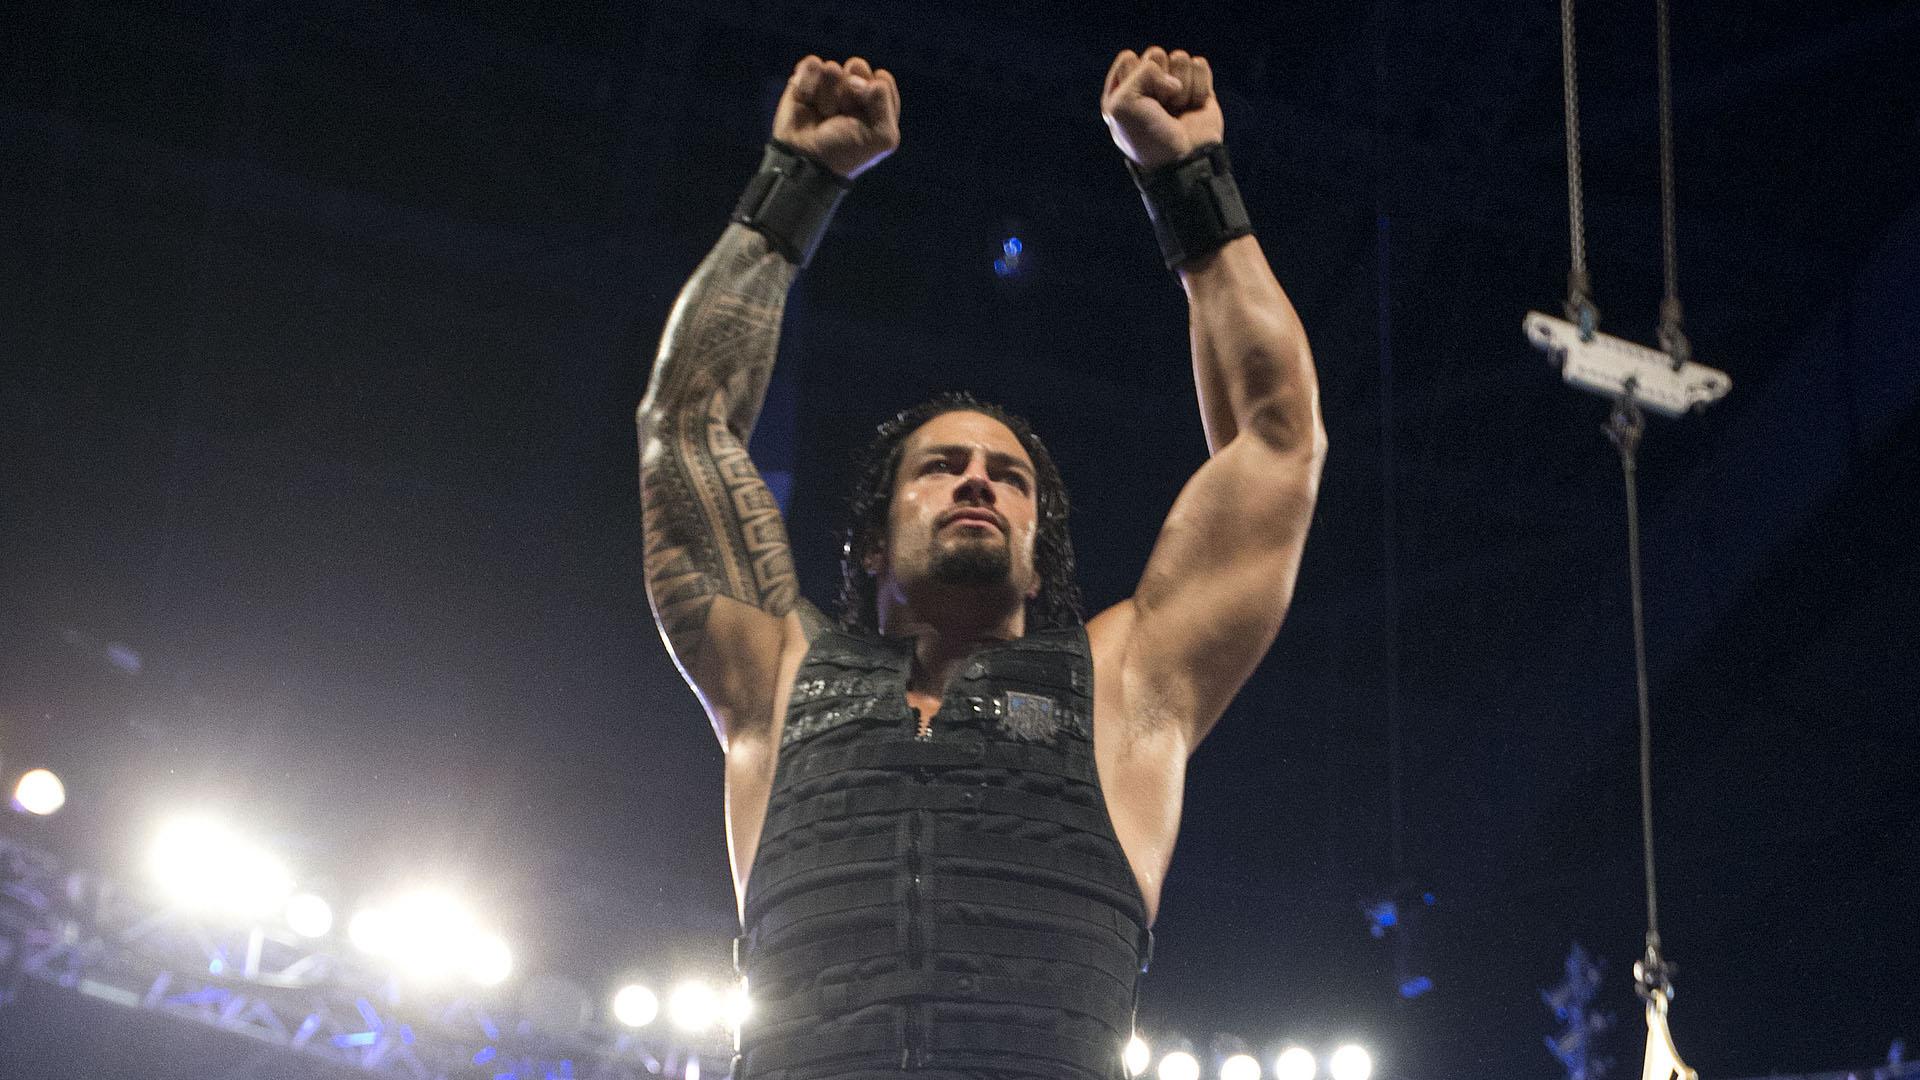 Roman Reigns-WWE-062014-AP-FTR.jpg